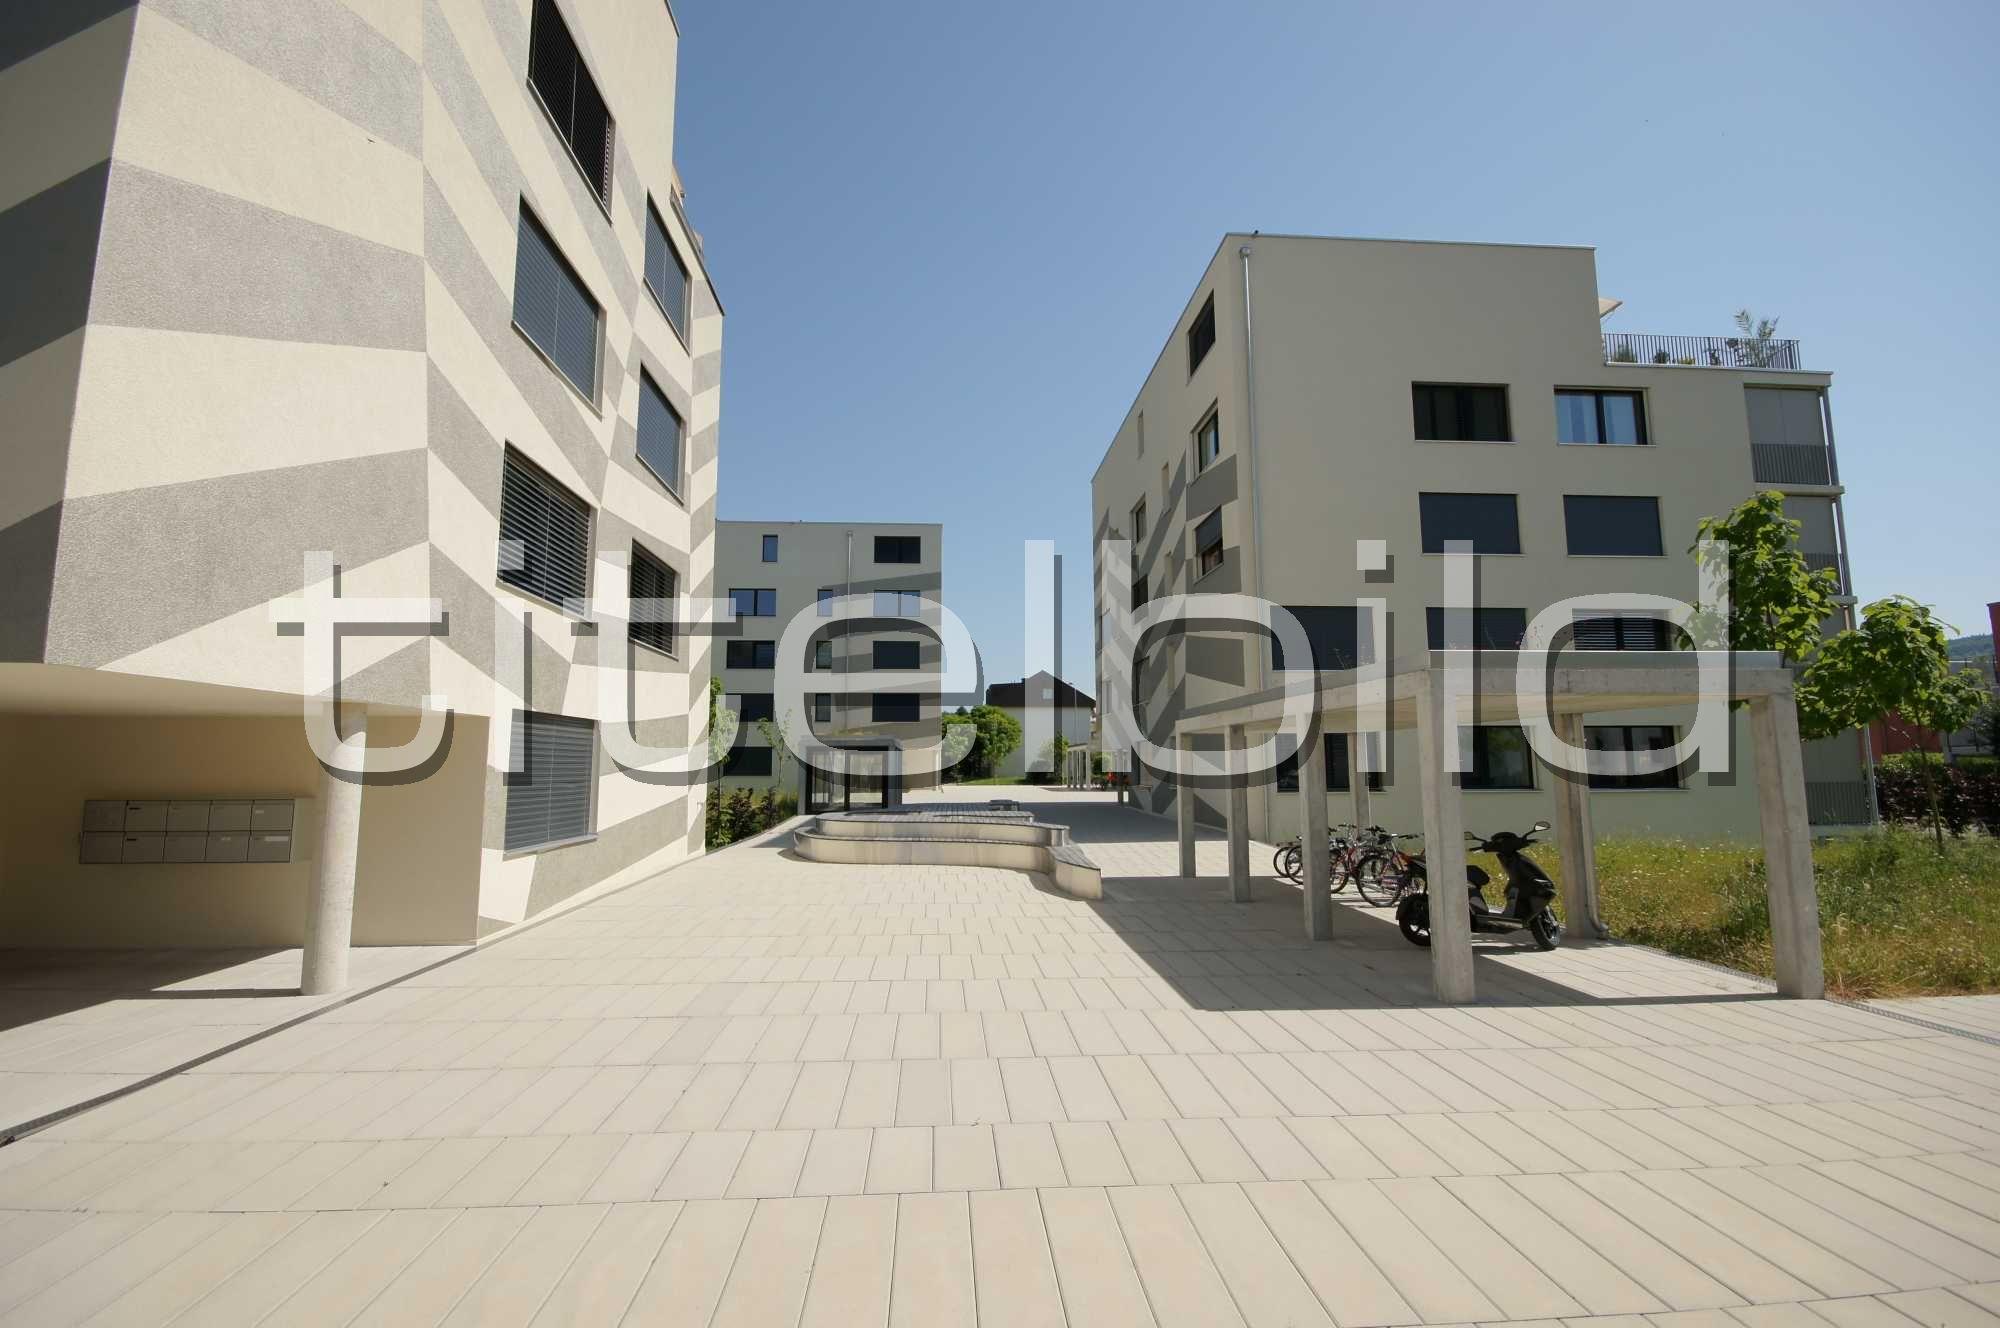 Projektbild-Nr. 3: Wohnüberbauung Dockland